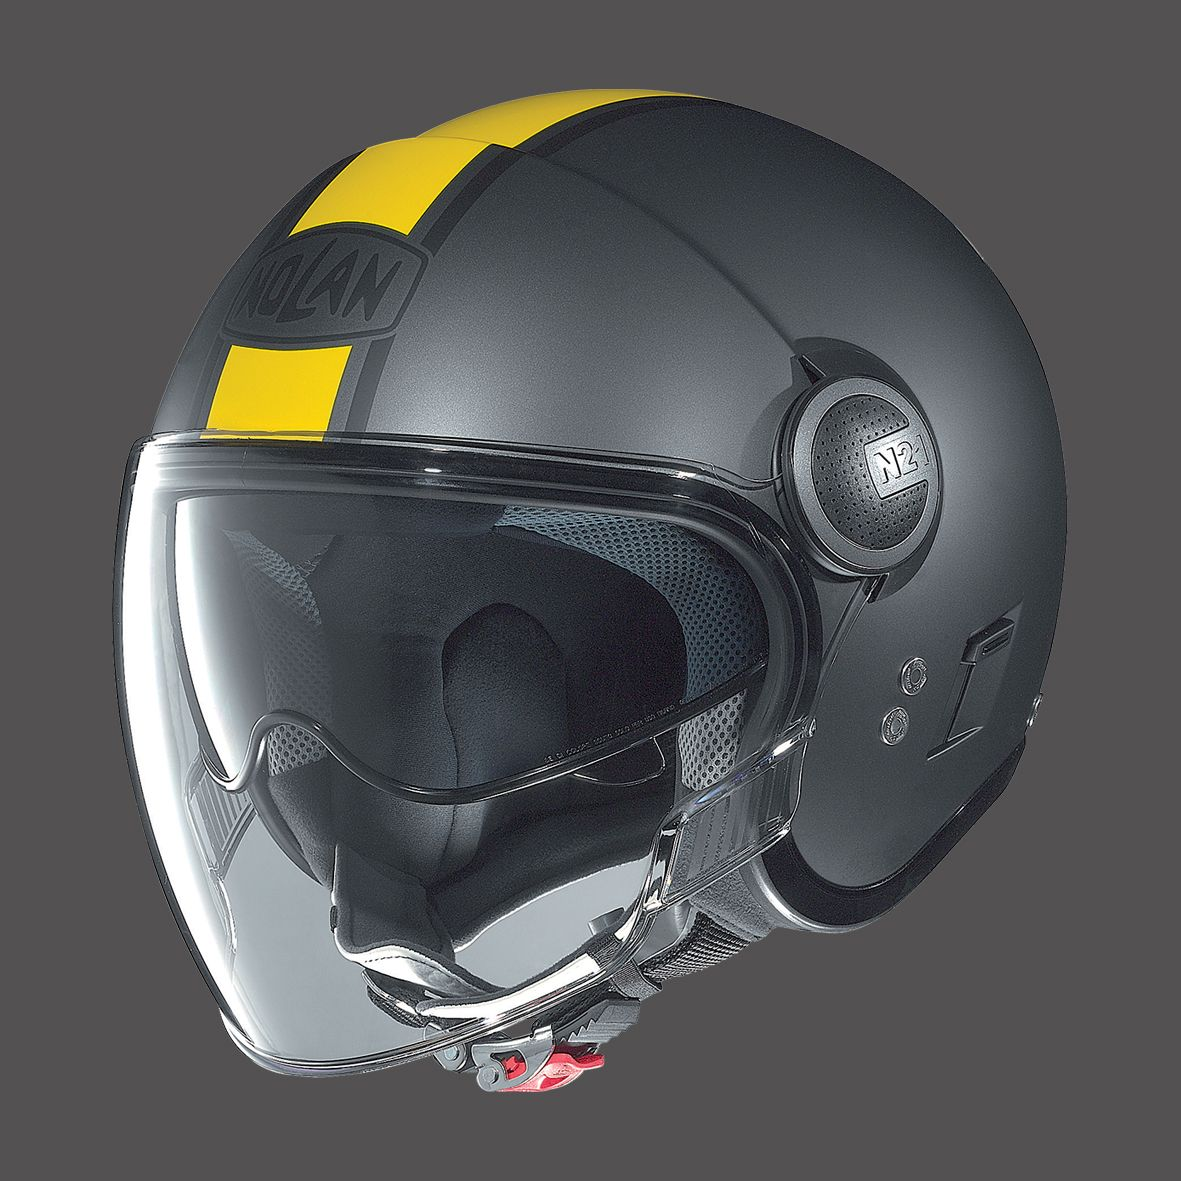 casco jet uso urbano nolan n21 visor flat asphalt black yellow